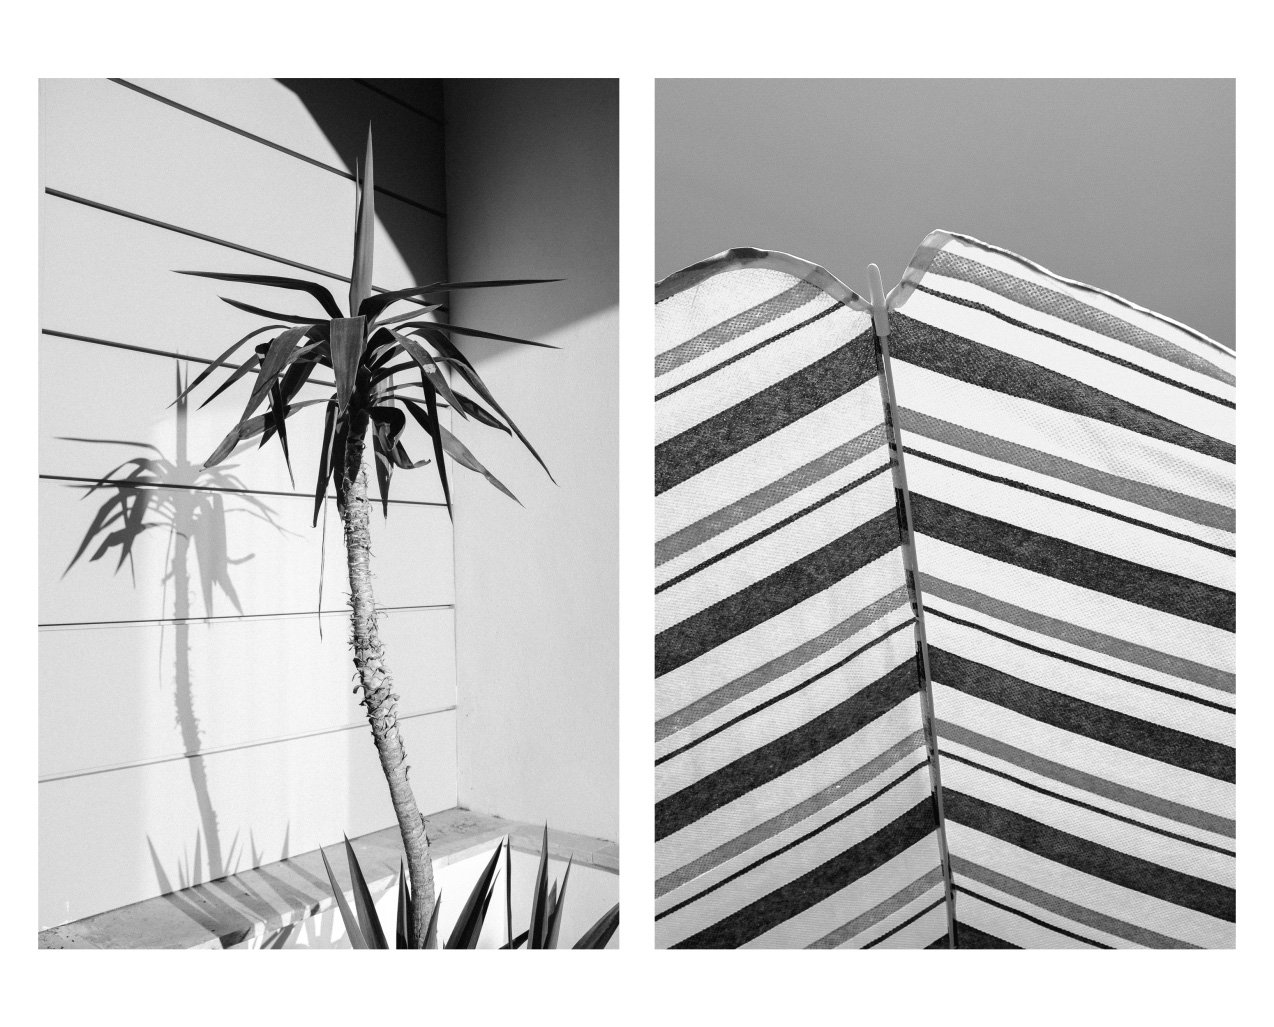 iGNANT-Photography-Antonio-Privitera-La-Nostalgia-02